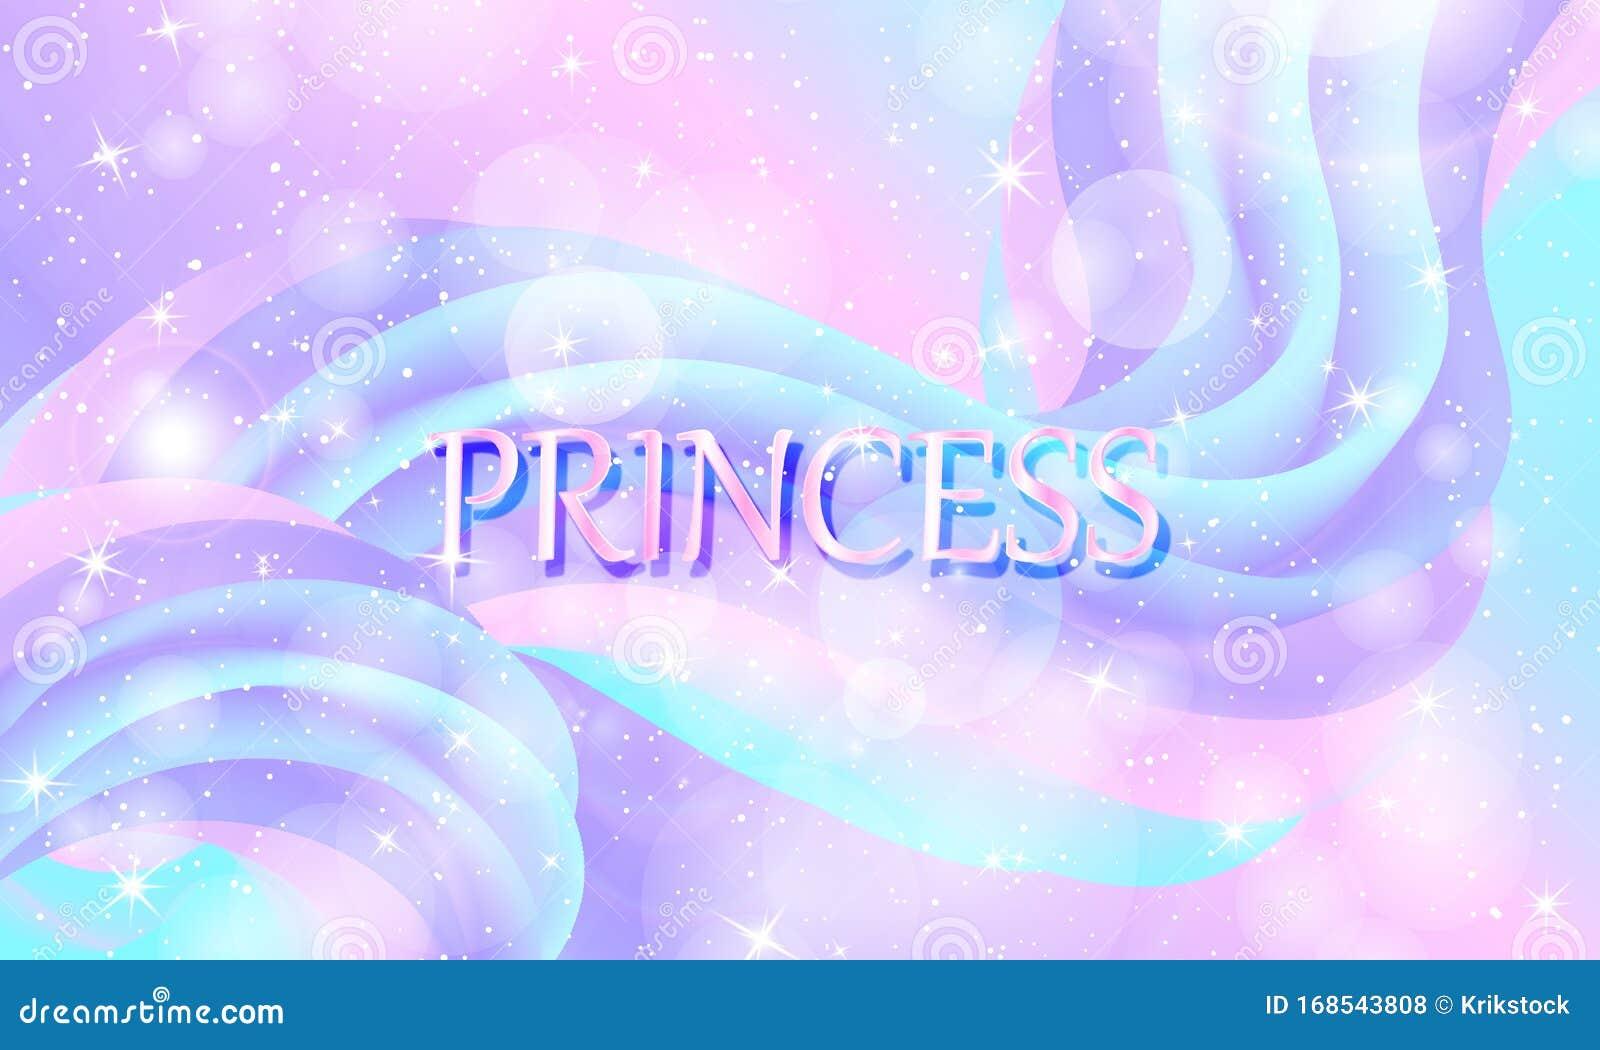 princess background mermaid rainbow vector magic stars unicorn pattern fantasy galaxy fairytale colors 168543808